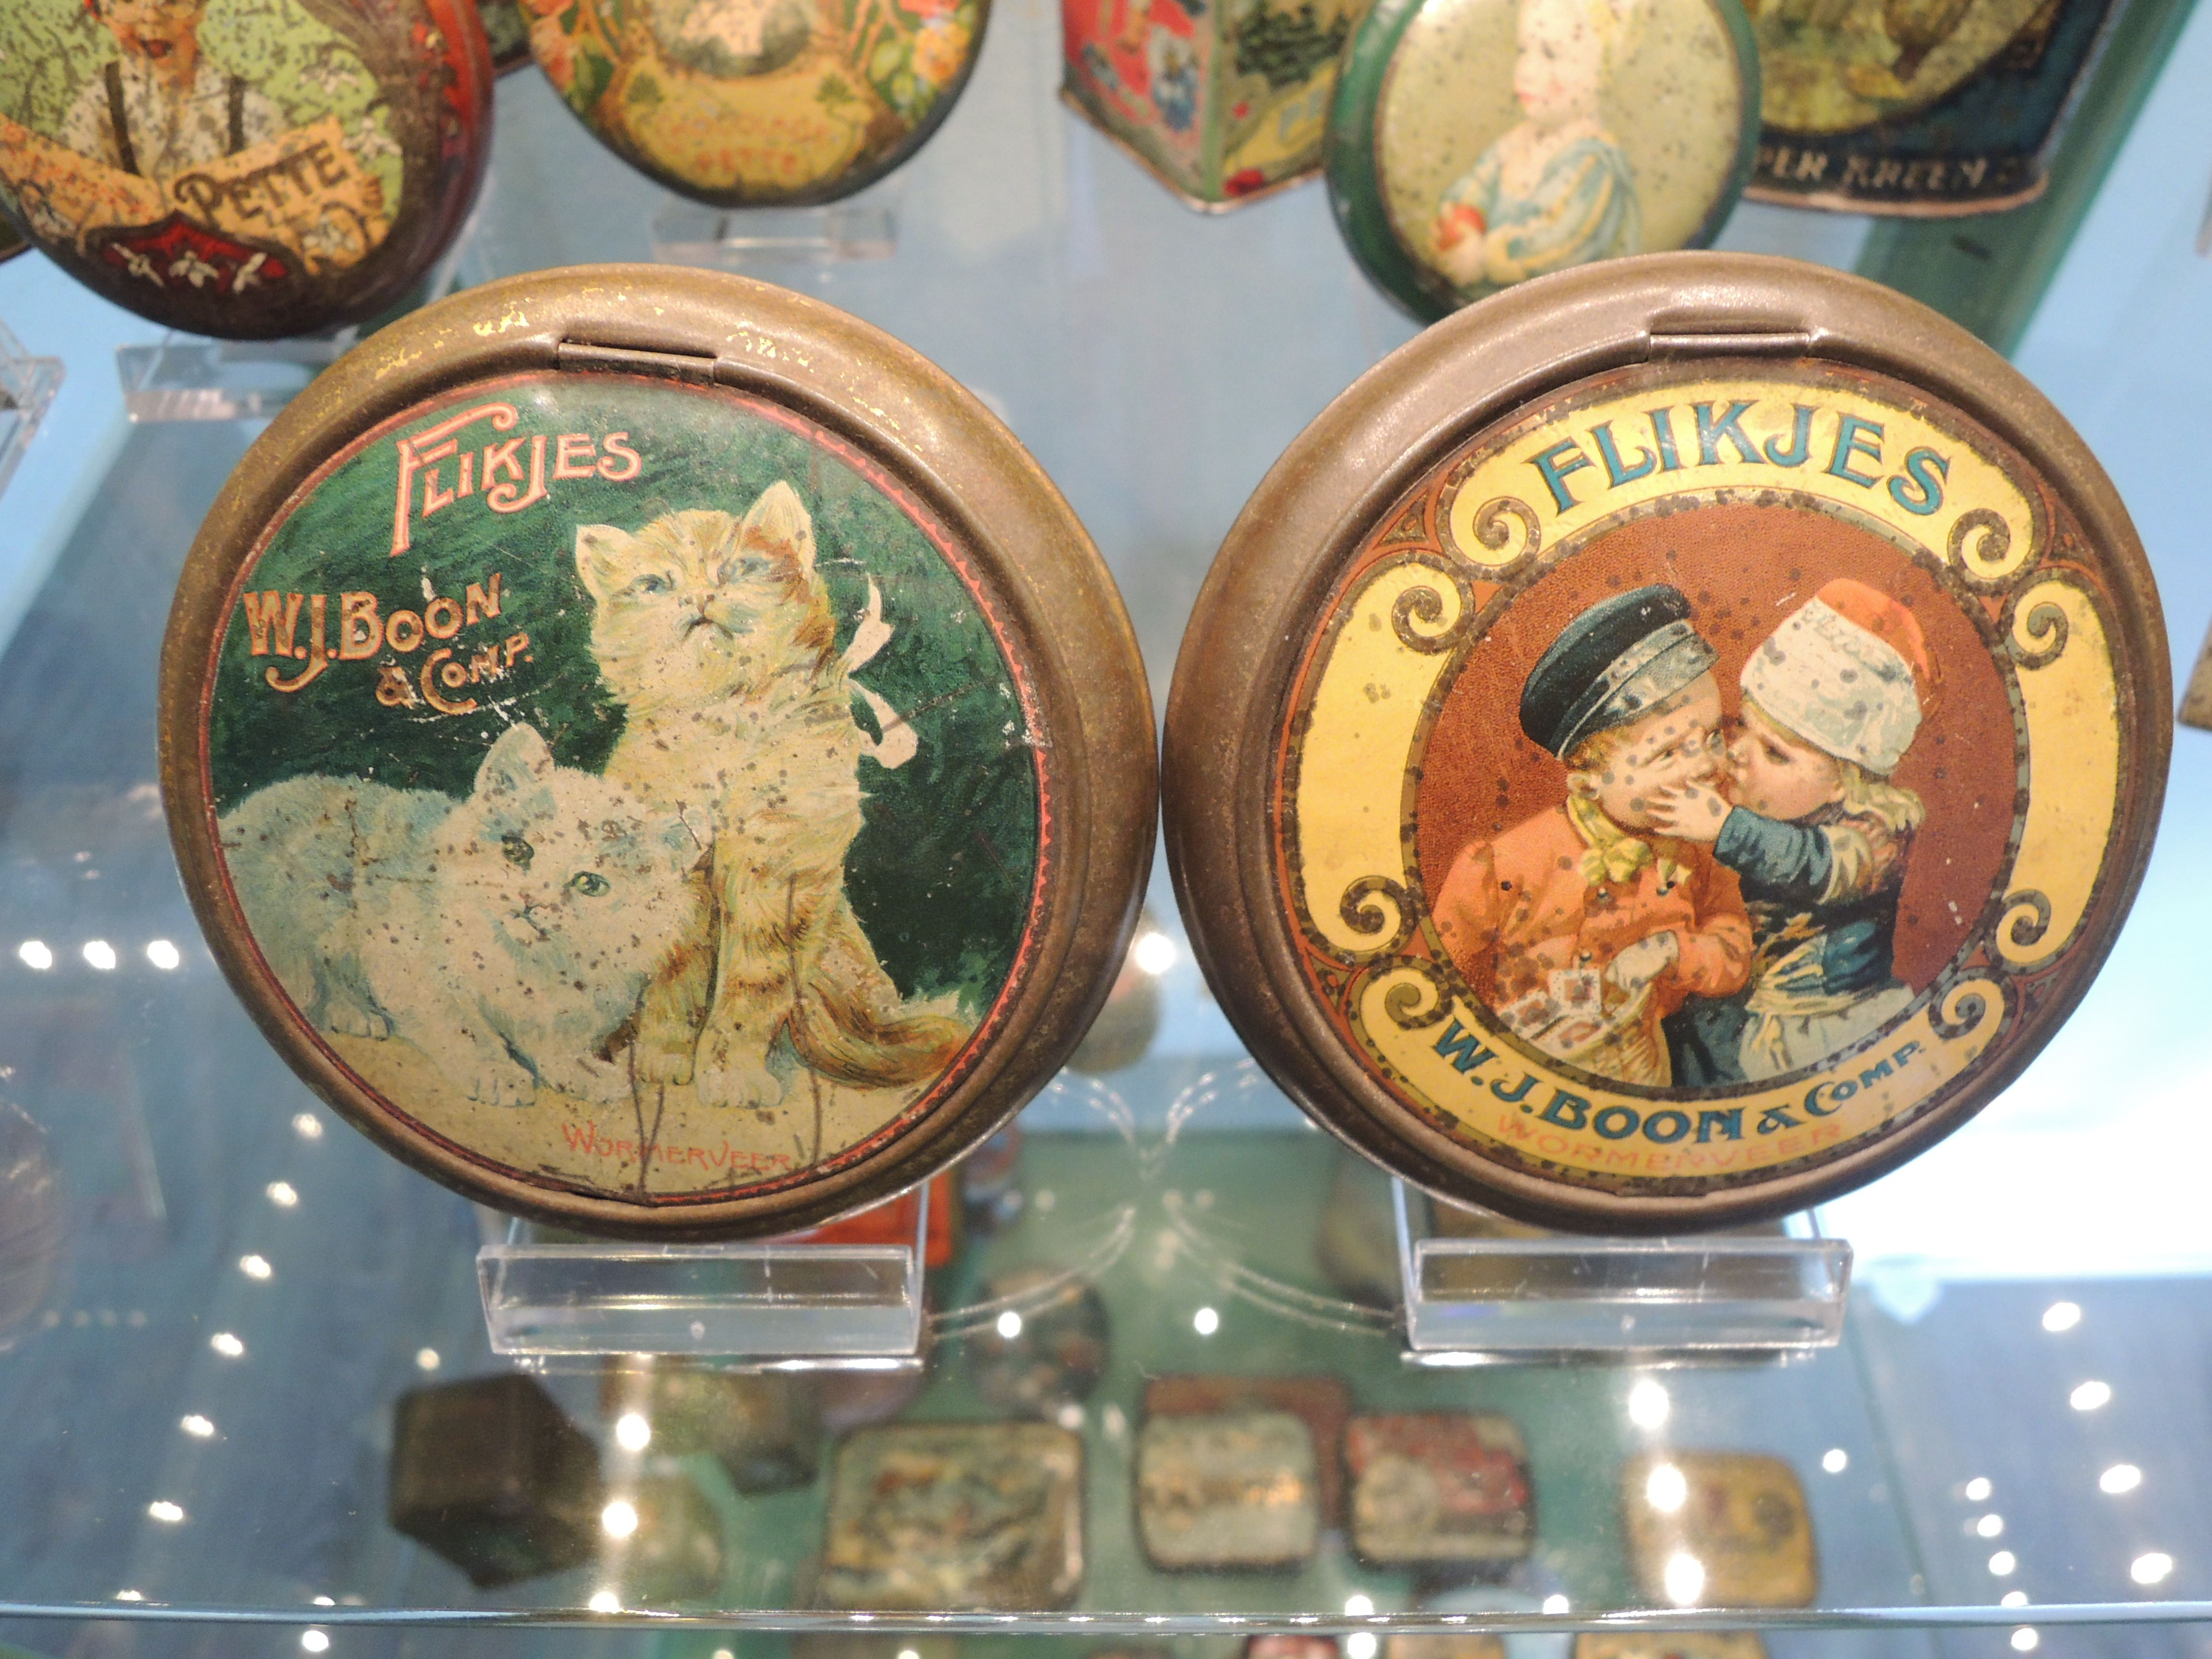 Love my tins from W.J. Boon, flikjes